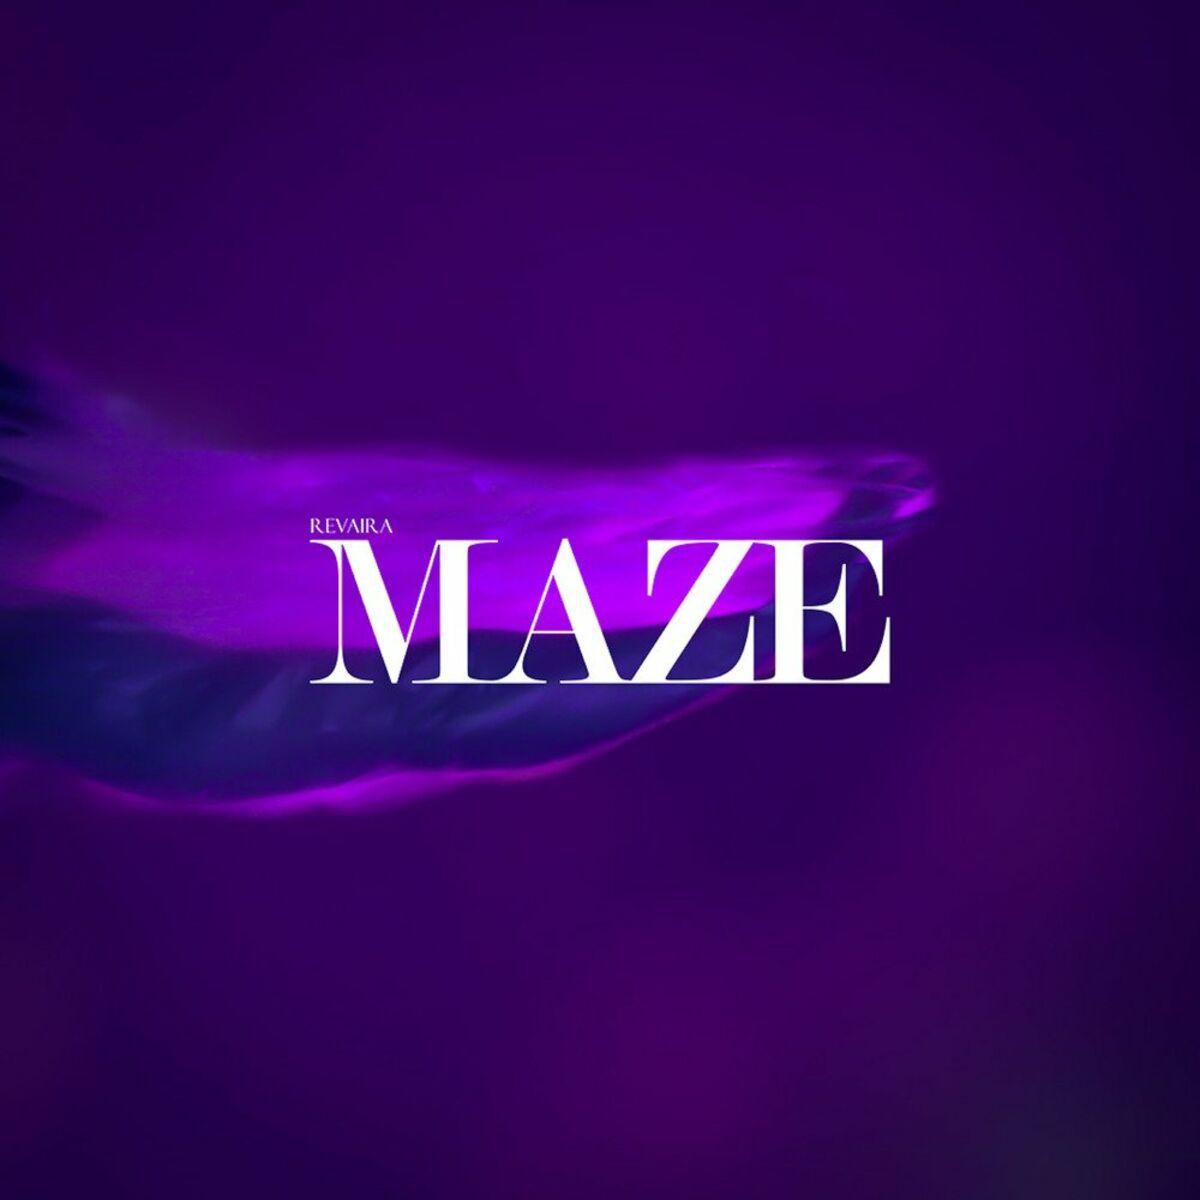 Revaira - Maze [single] (2021)